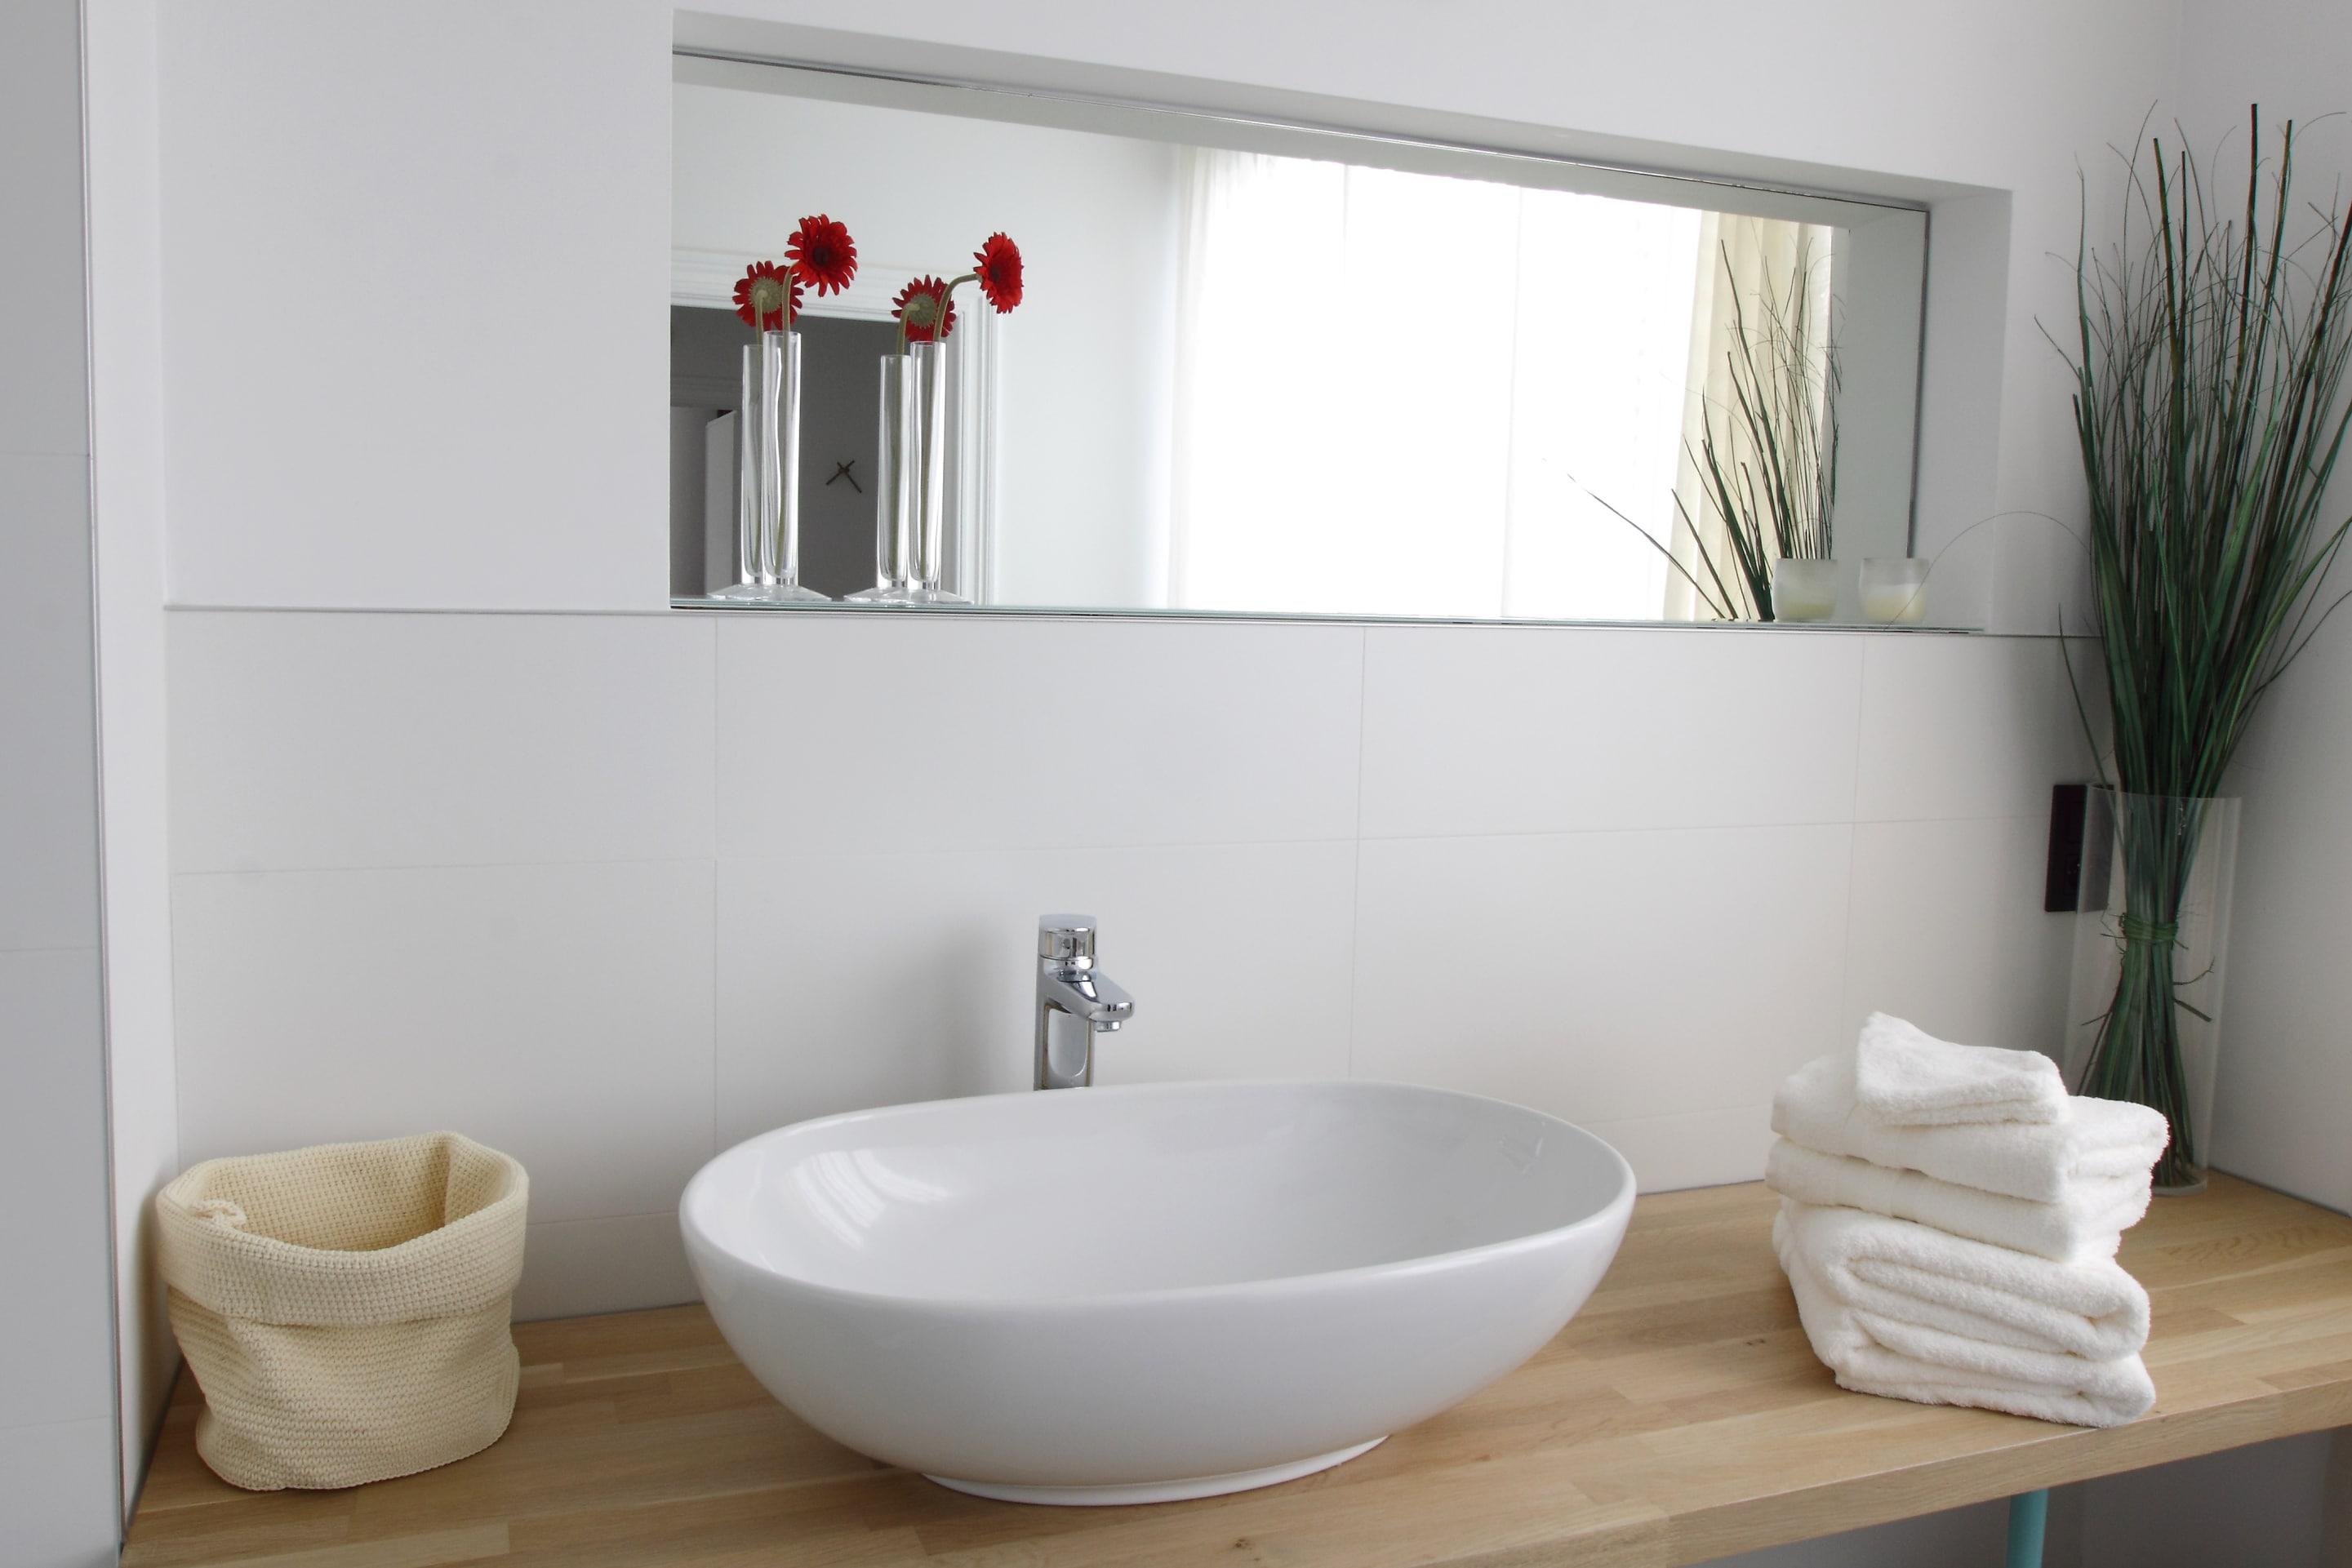 Plan Vasque En Pierre prix d'un plan vasque de salle de bain